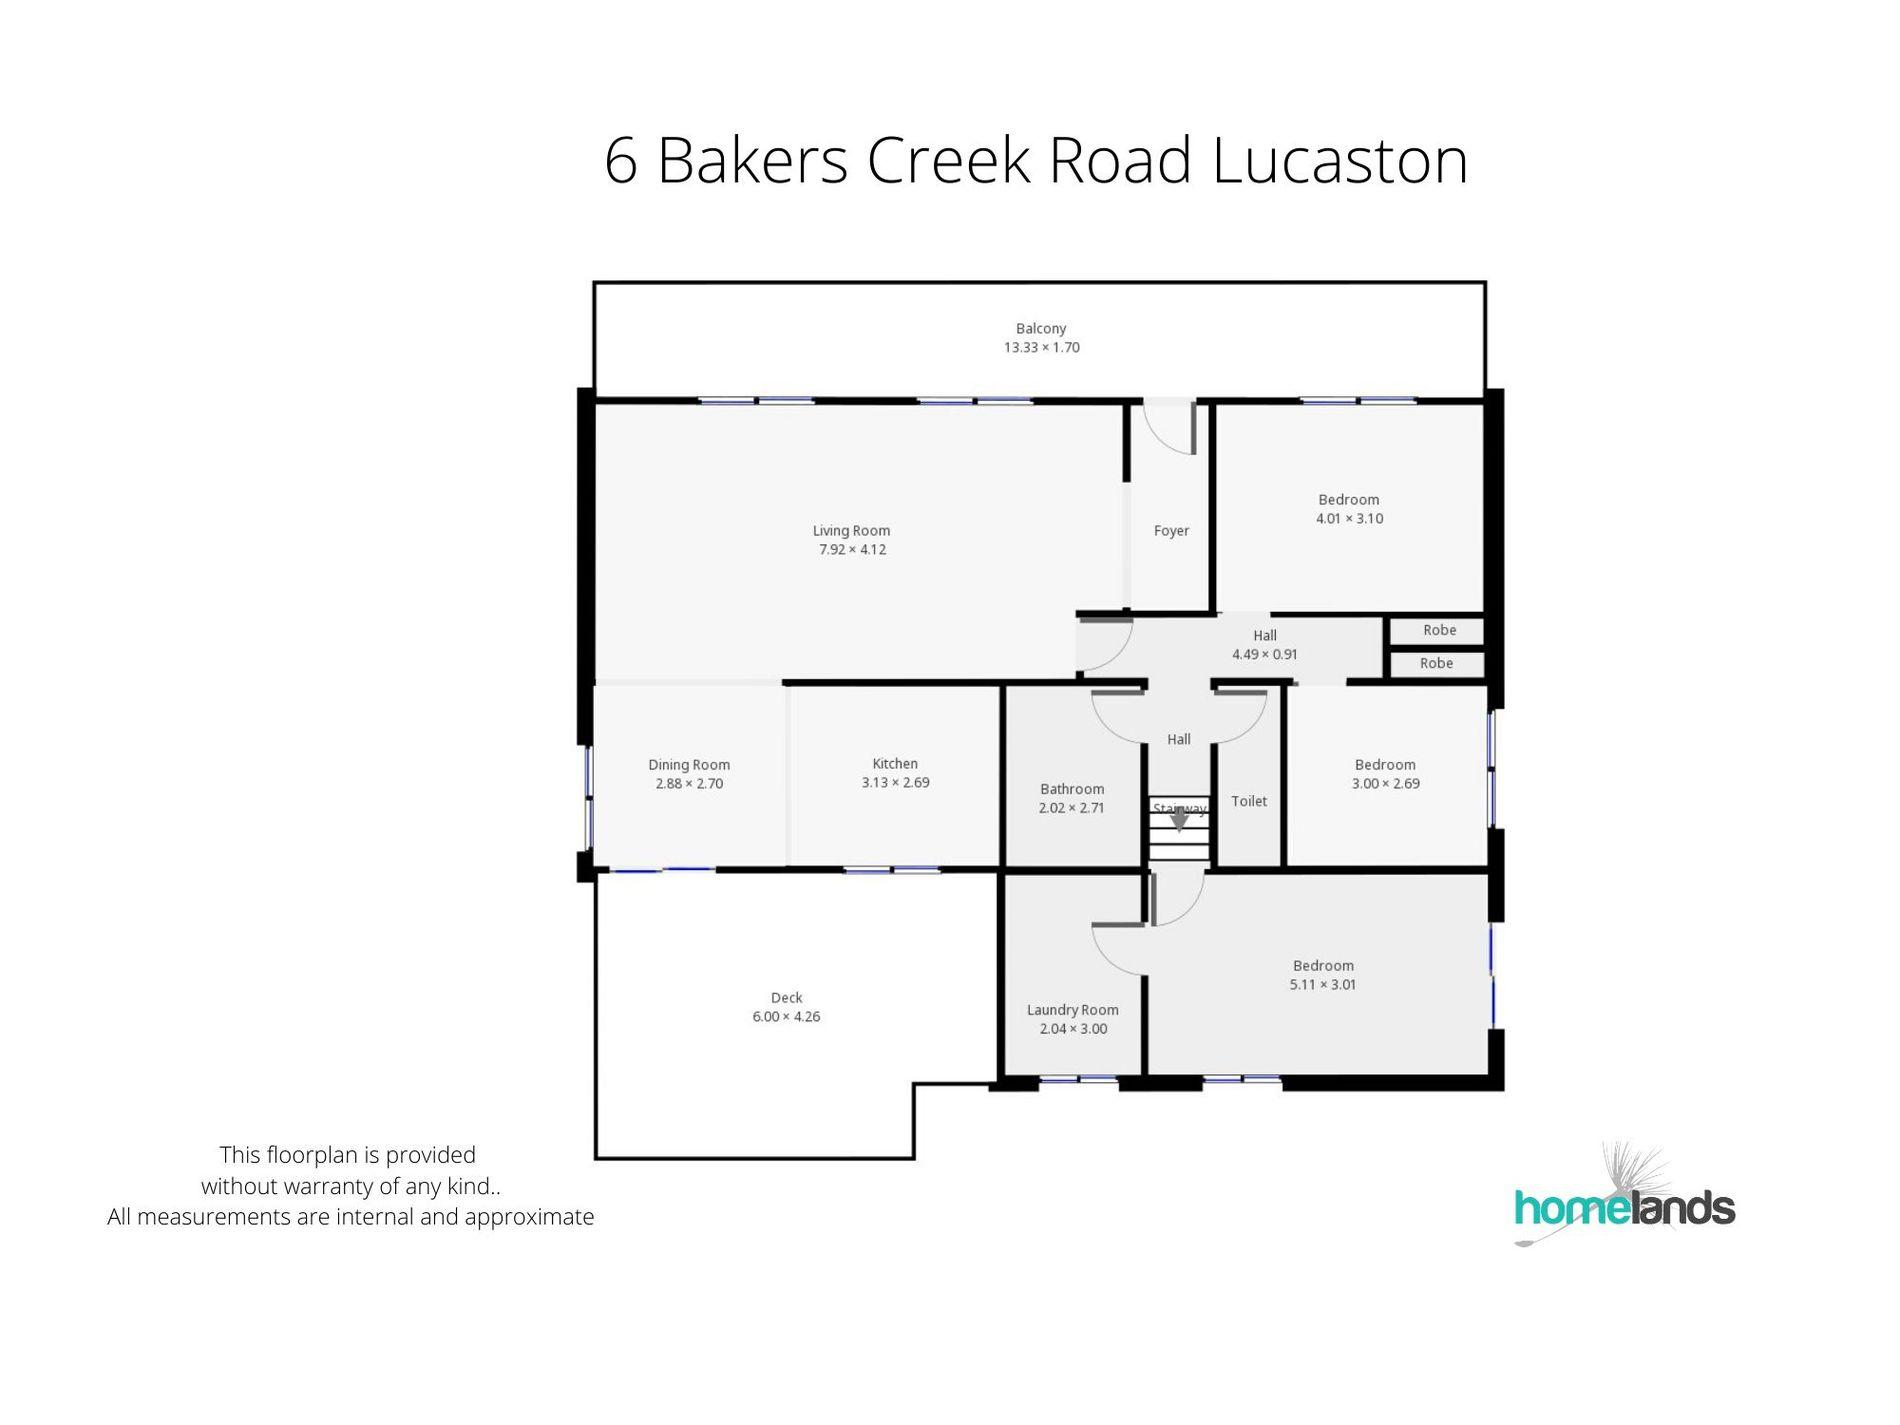 6 Bakers Creek Road, Lucaston